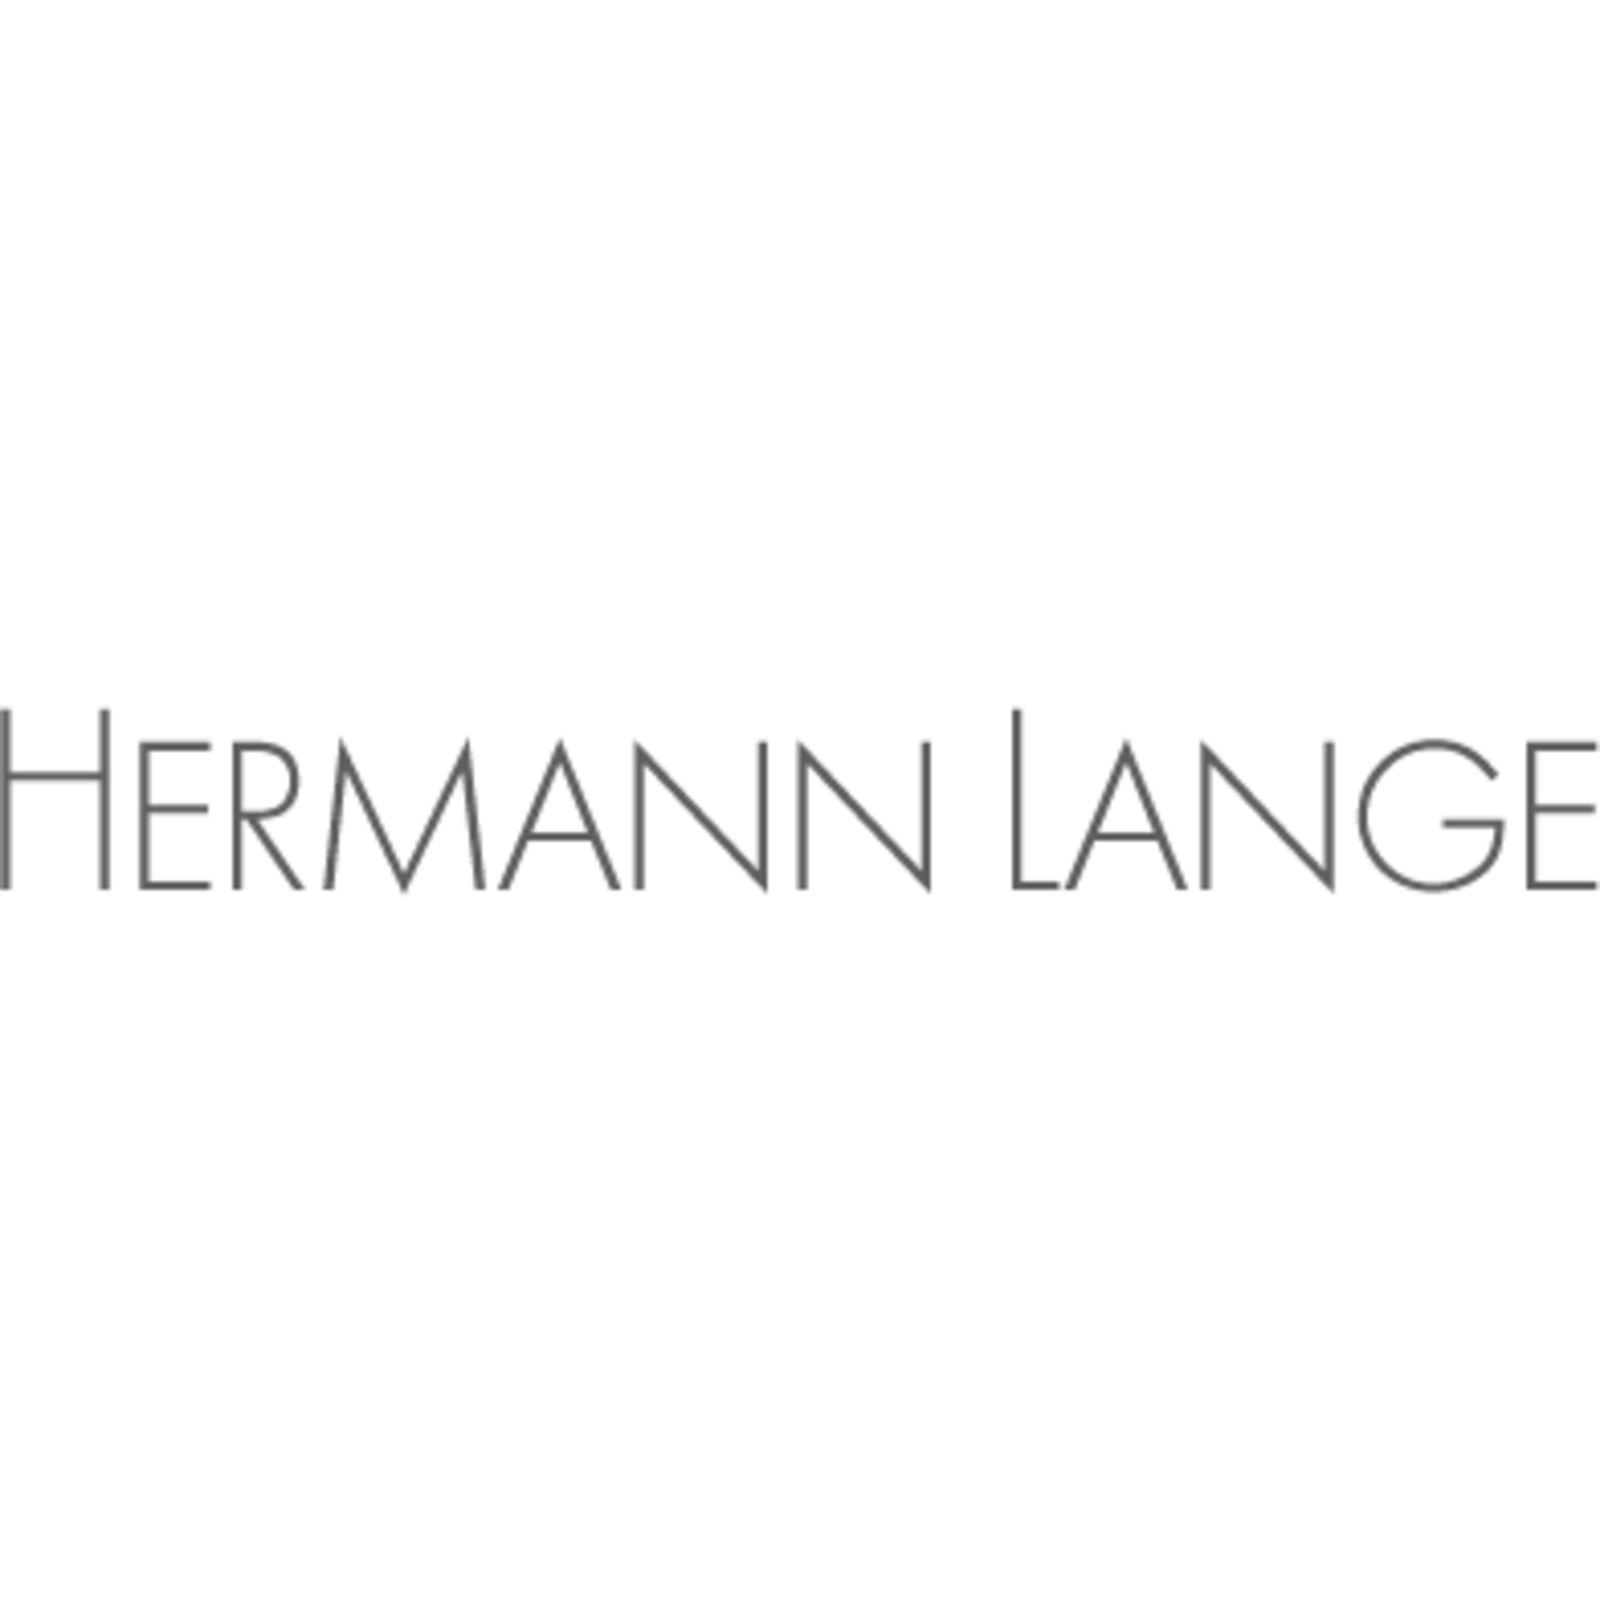 HERMANN LANGE